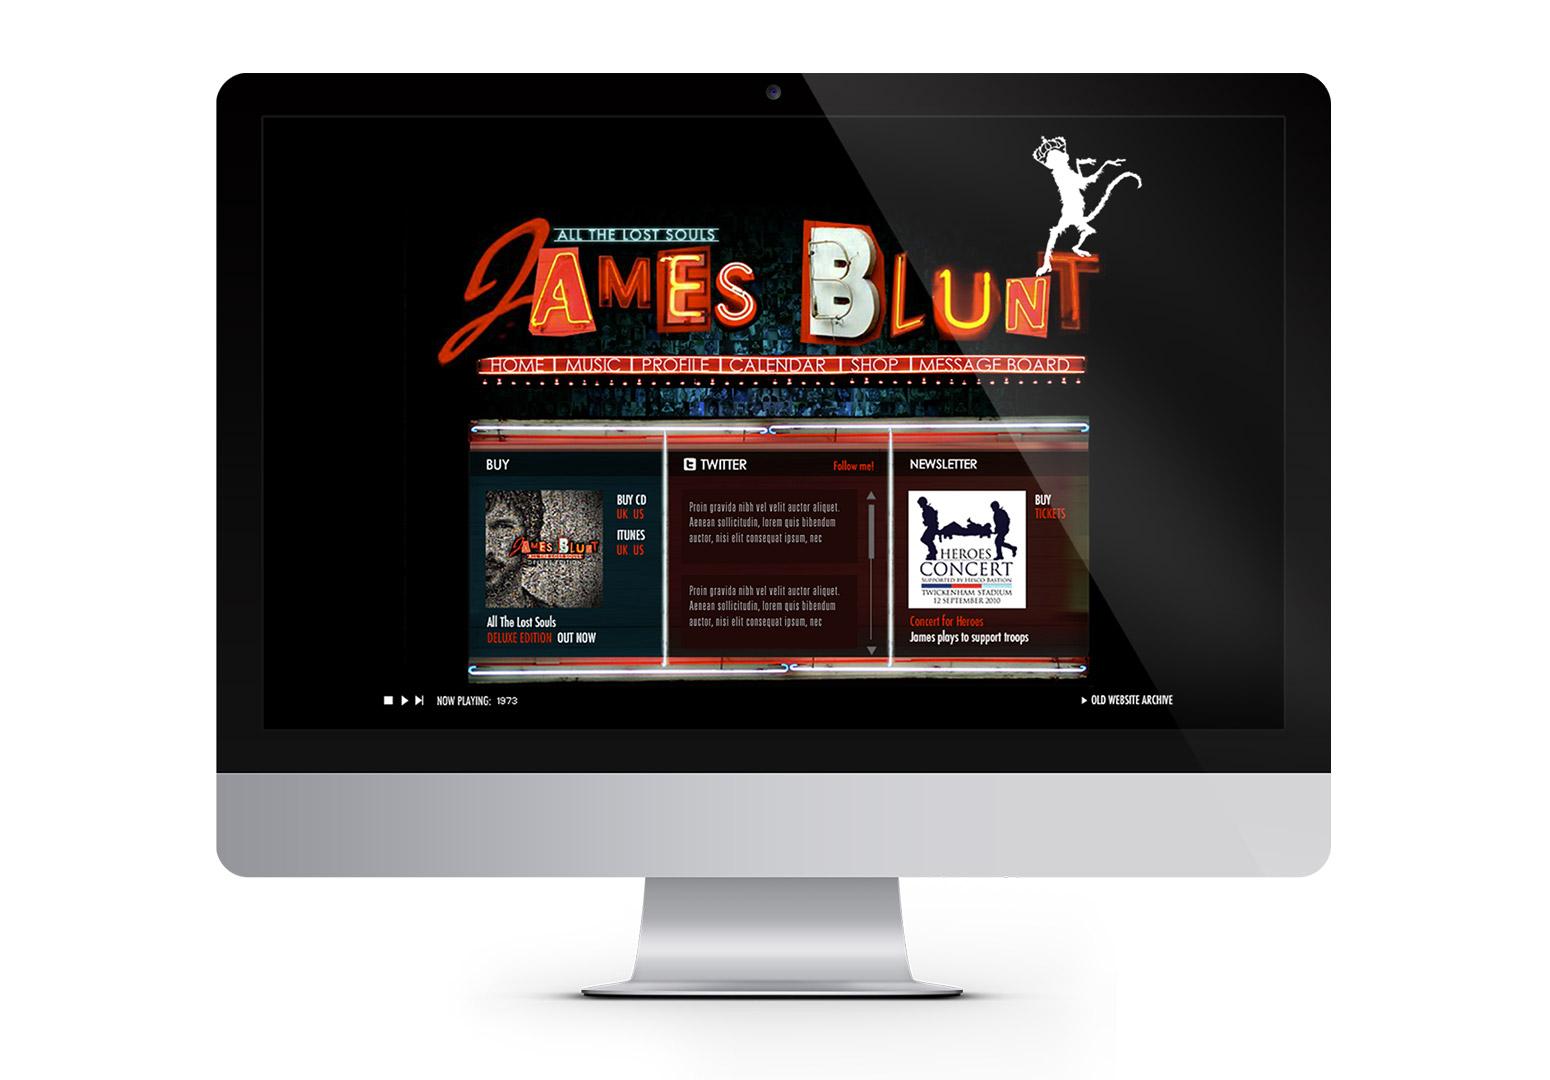 JamesBlunt_Slide_Device_Home